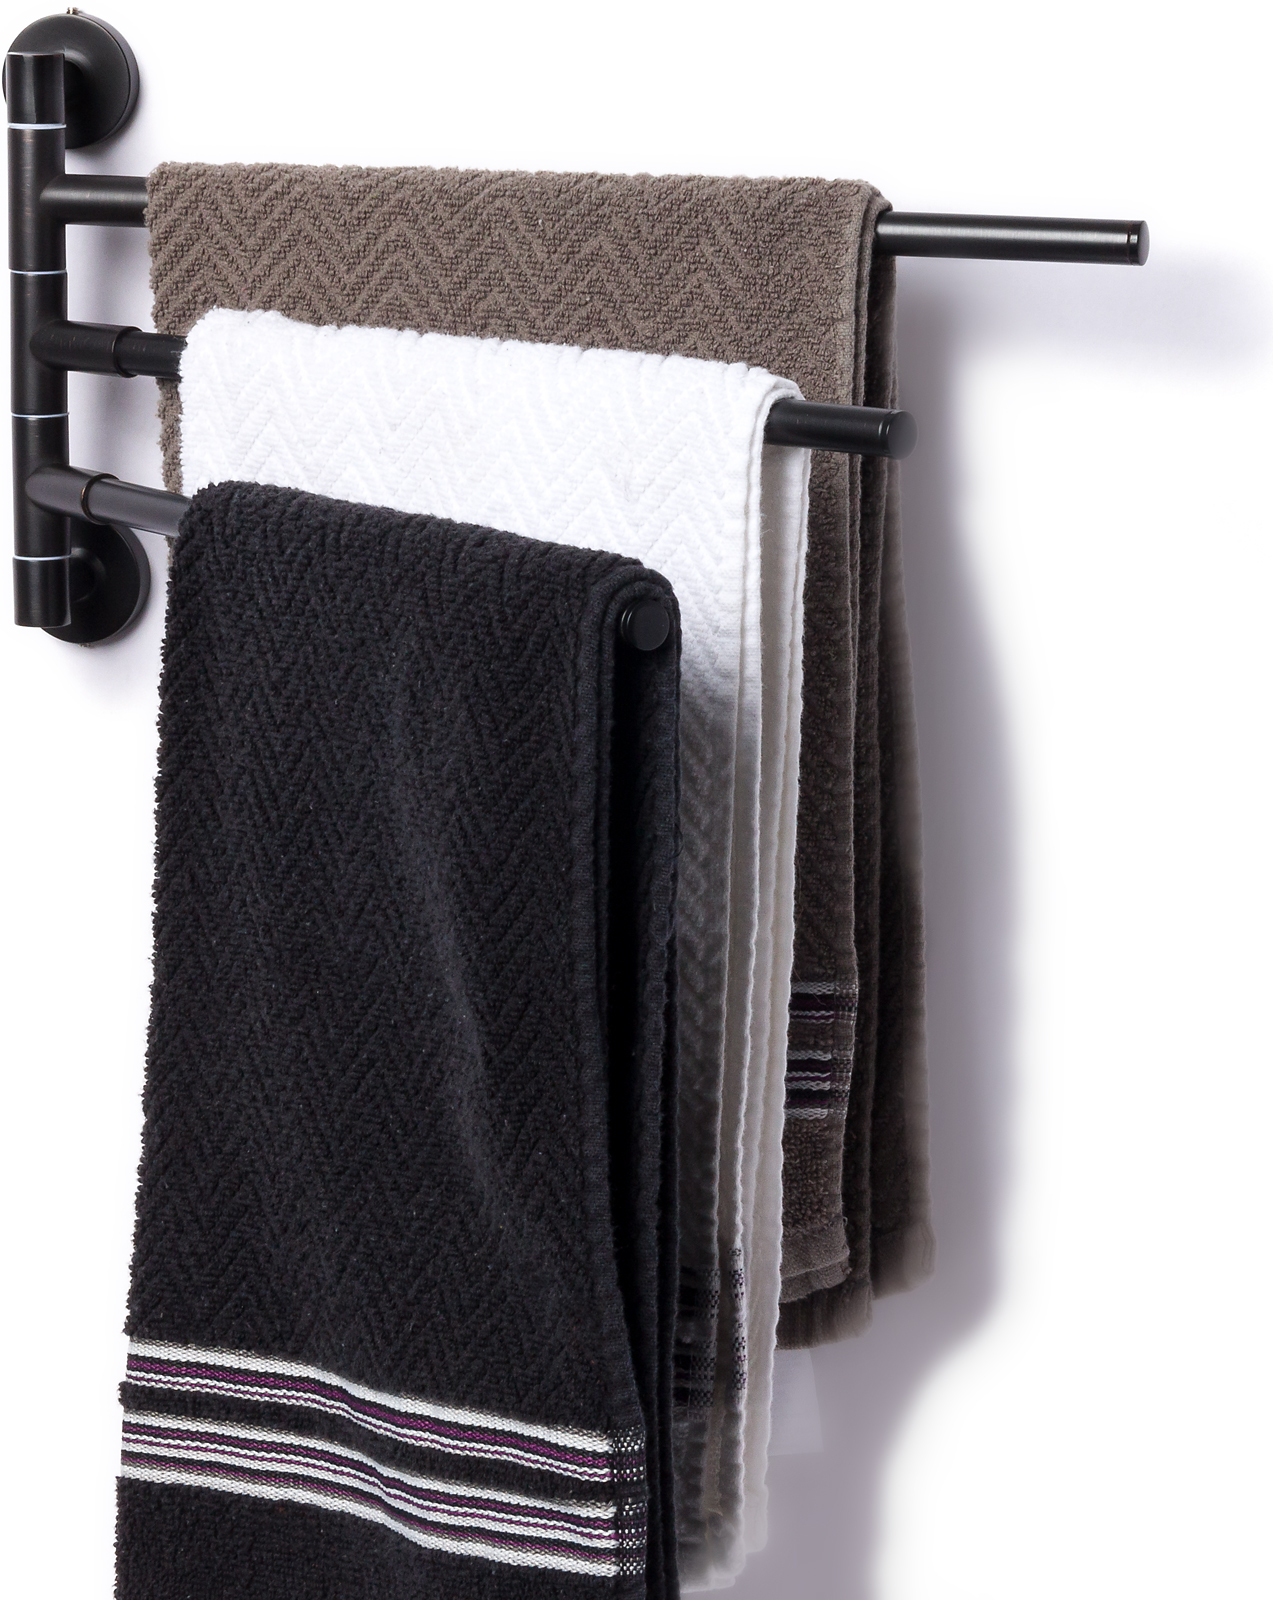 mindful design 3 prong swing arm bathroom towel bar rack